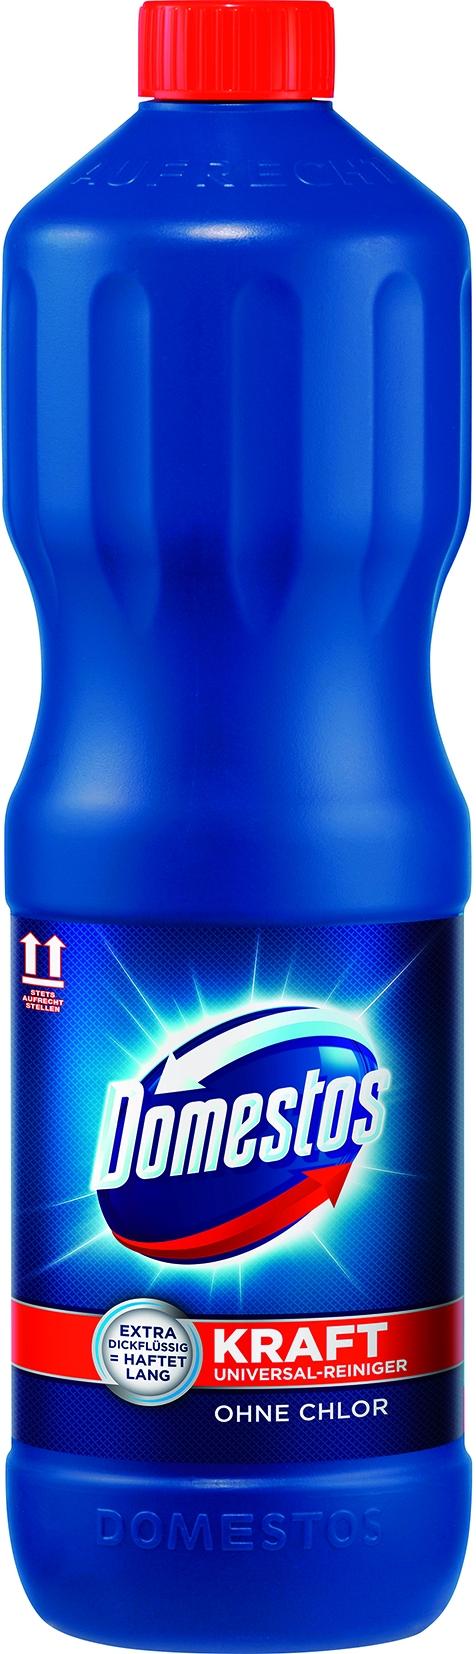 Domestos Hygiene-Reiniger Blau